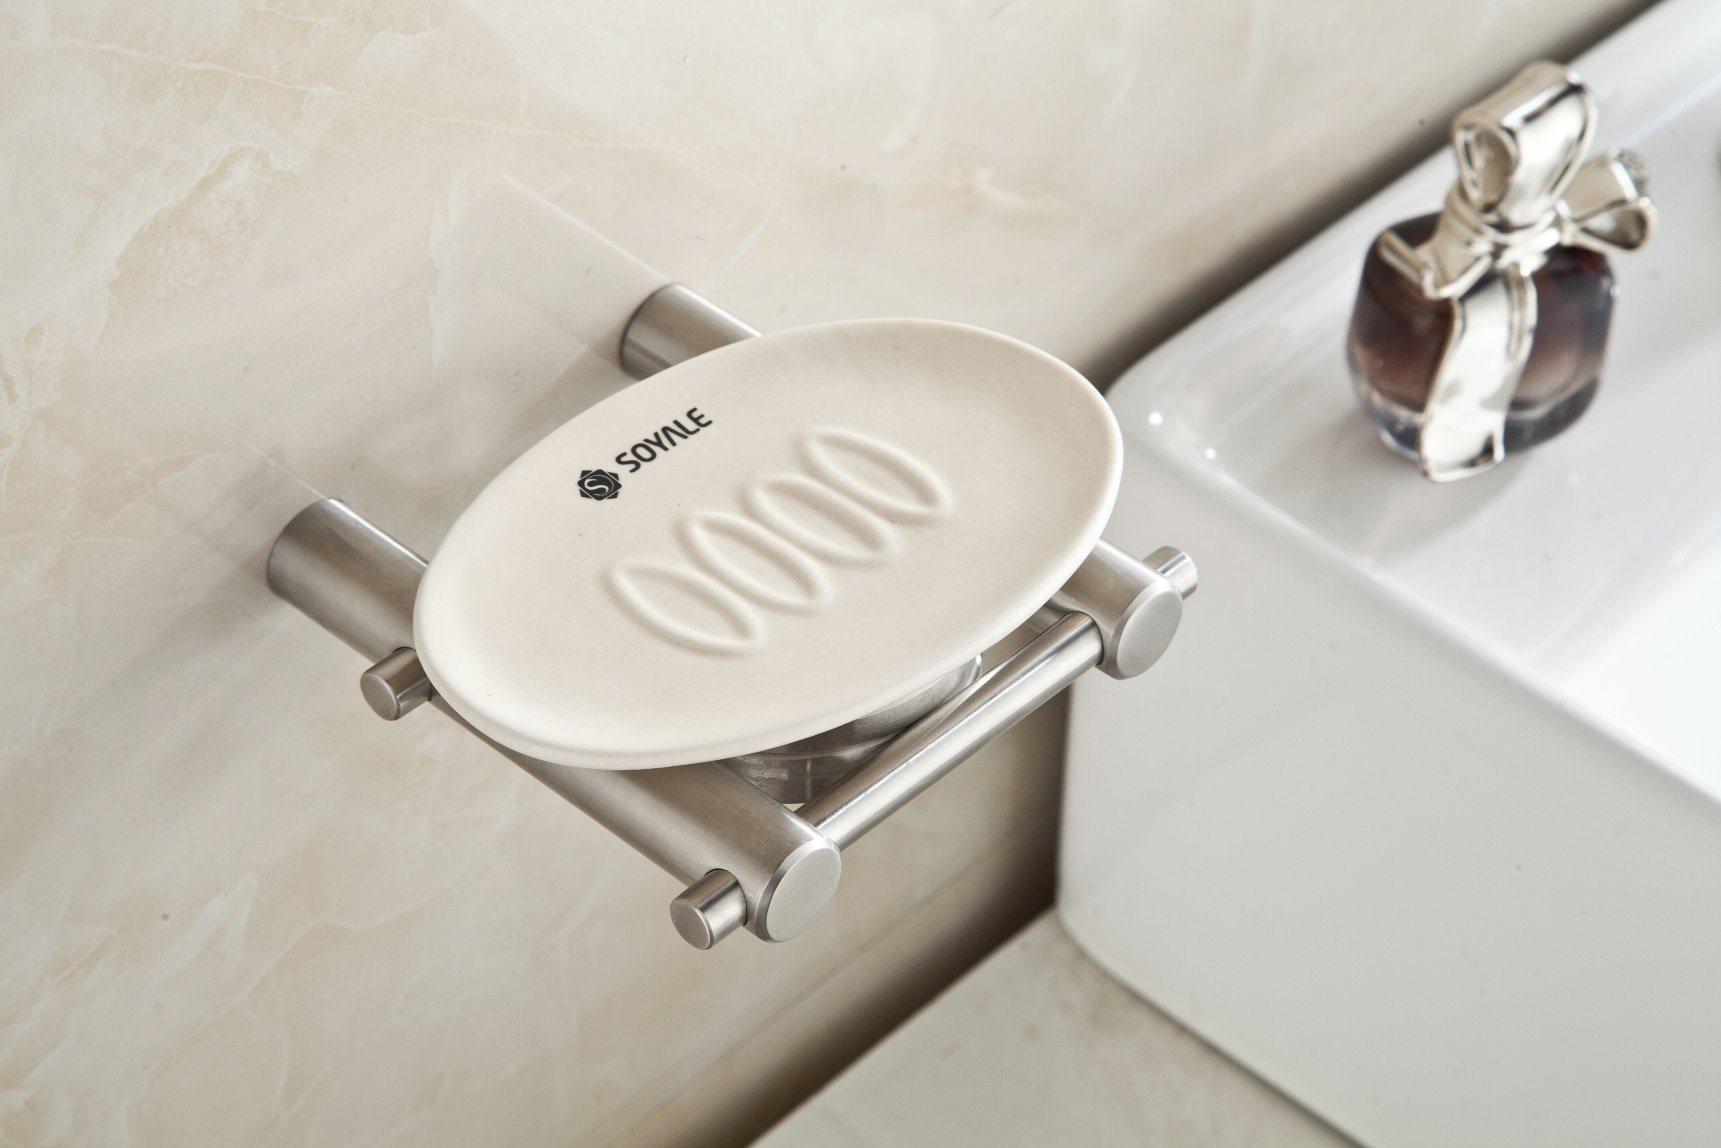 Brushed Nickel Soap Dish Stainless Steel 304 Soap Shower Holder  for Bathroom